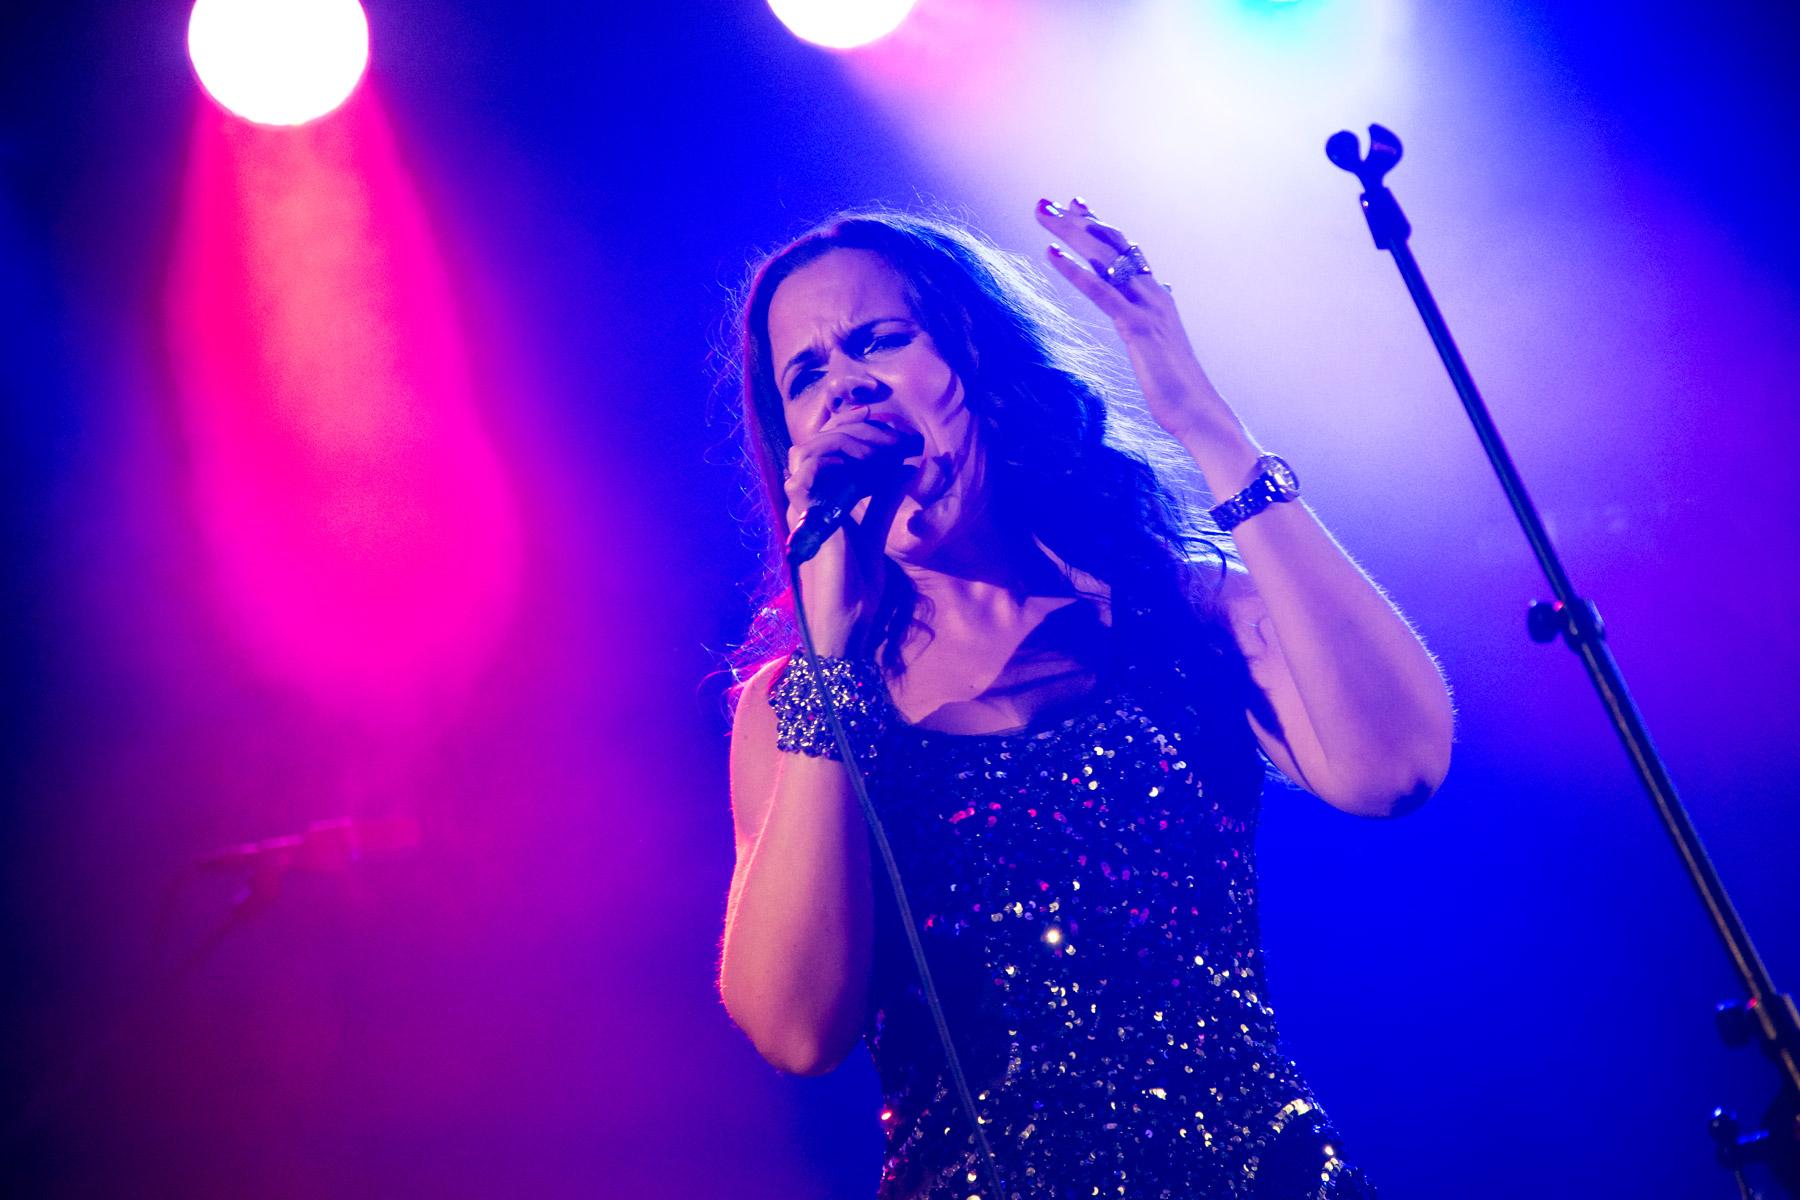 Love True release concert @ Ila Aktivitetshus - October 15th 2014.  Photo: Christina Listanco Einmo